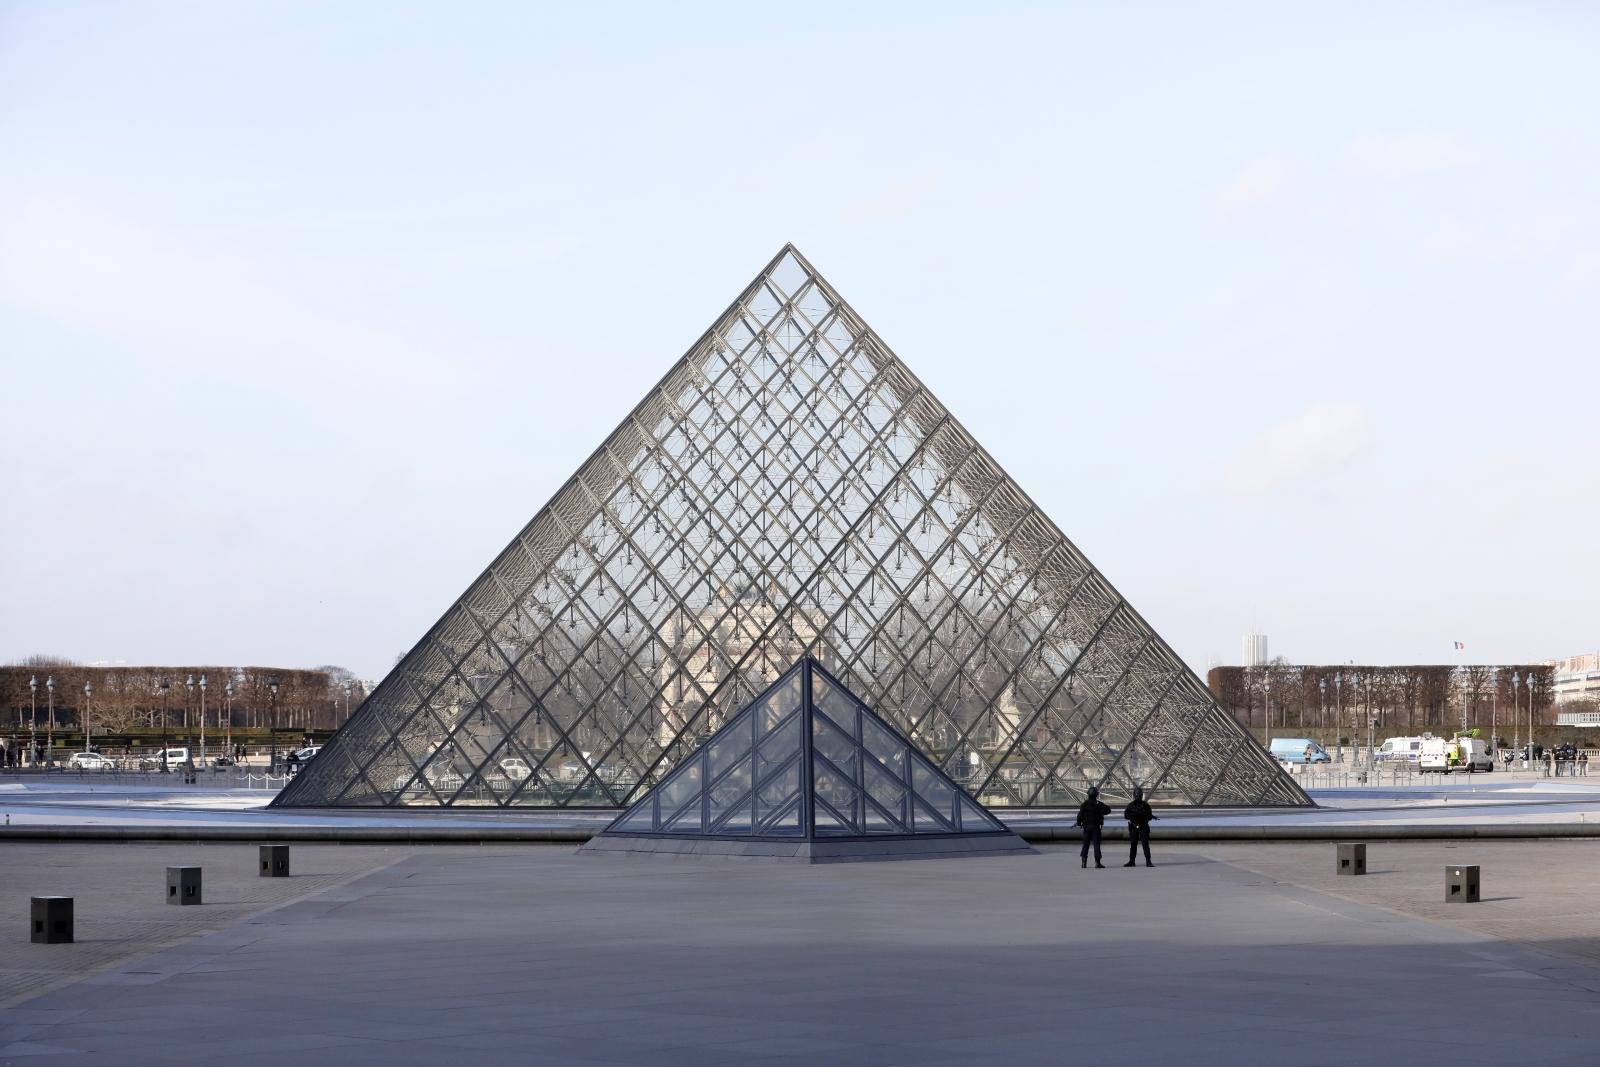 Piramida przed Luwrem. Fot. PAP/EPA/IAN LANGSDON